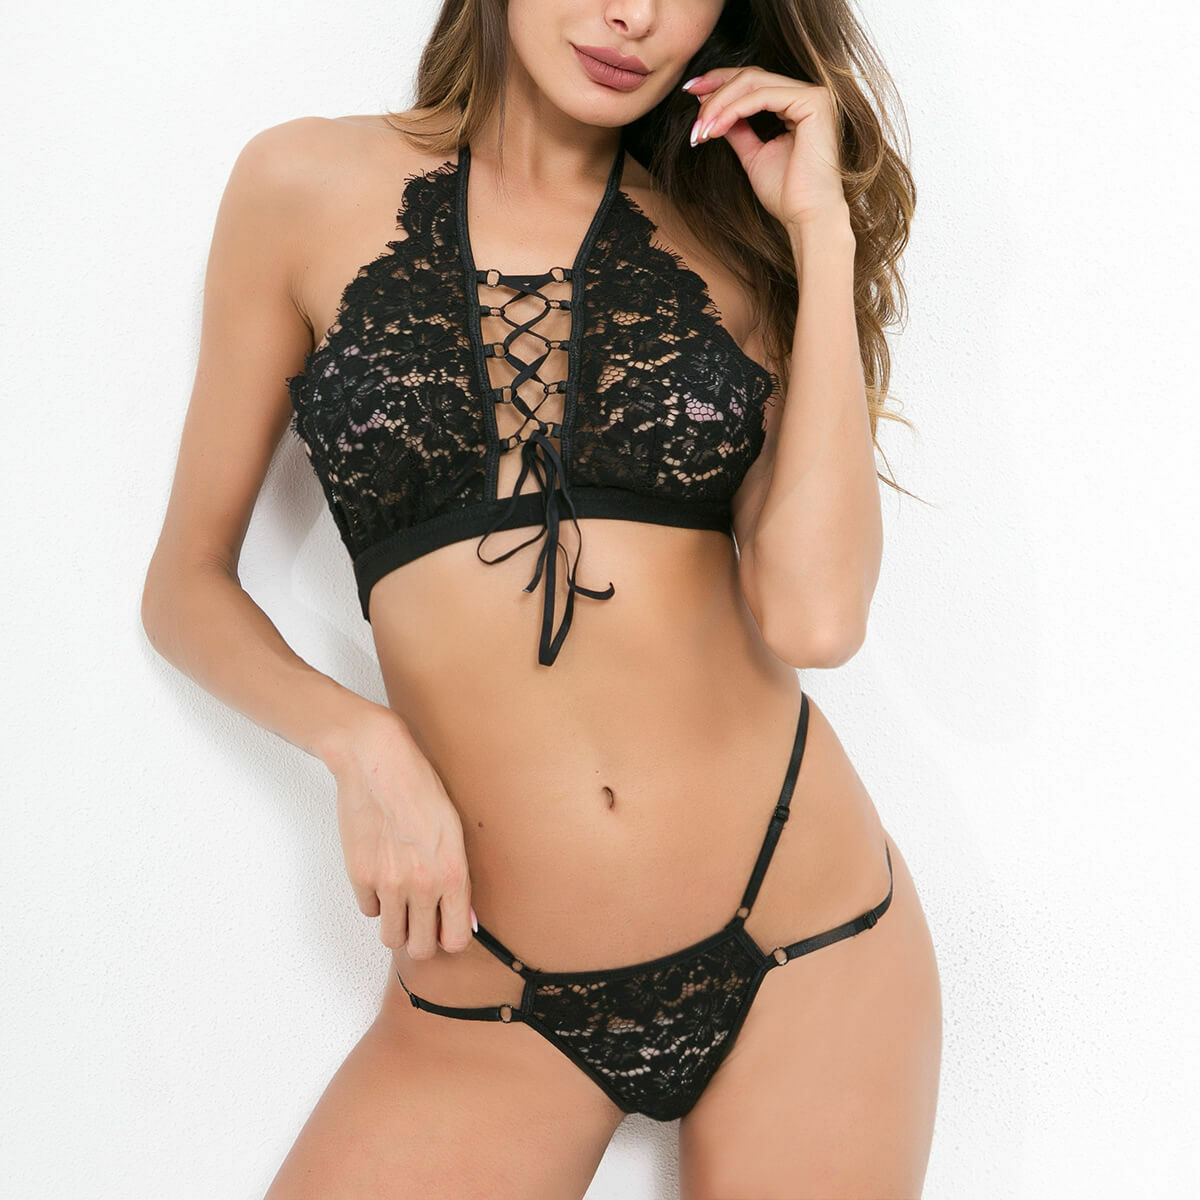 089a9f9d3 Sexy Black Strappy Lace Bralette Bra Lingerie Set Underwear Panties ...